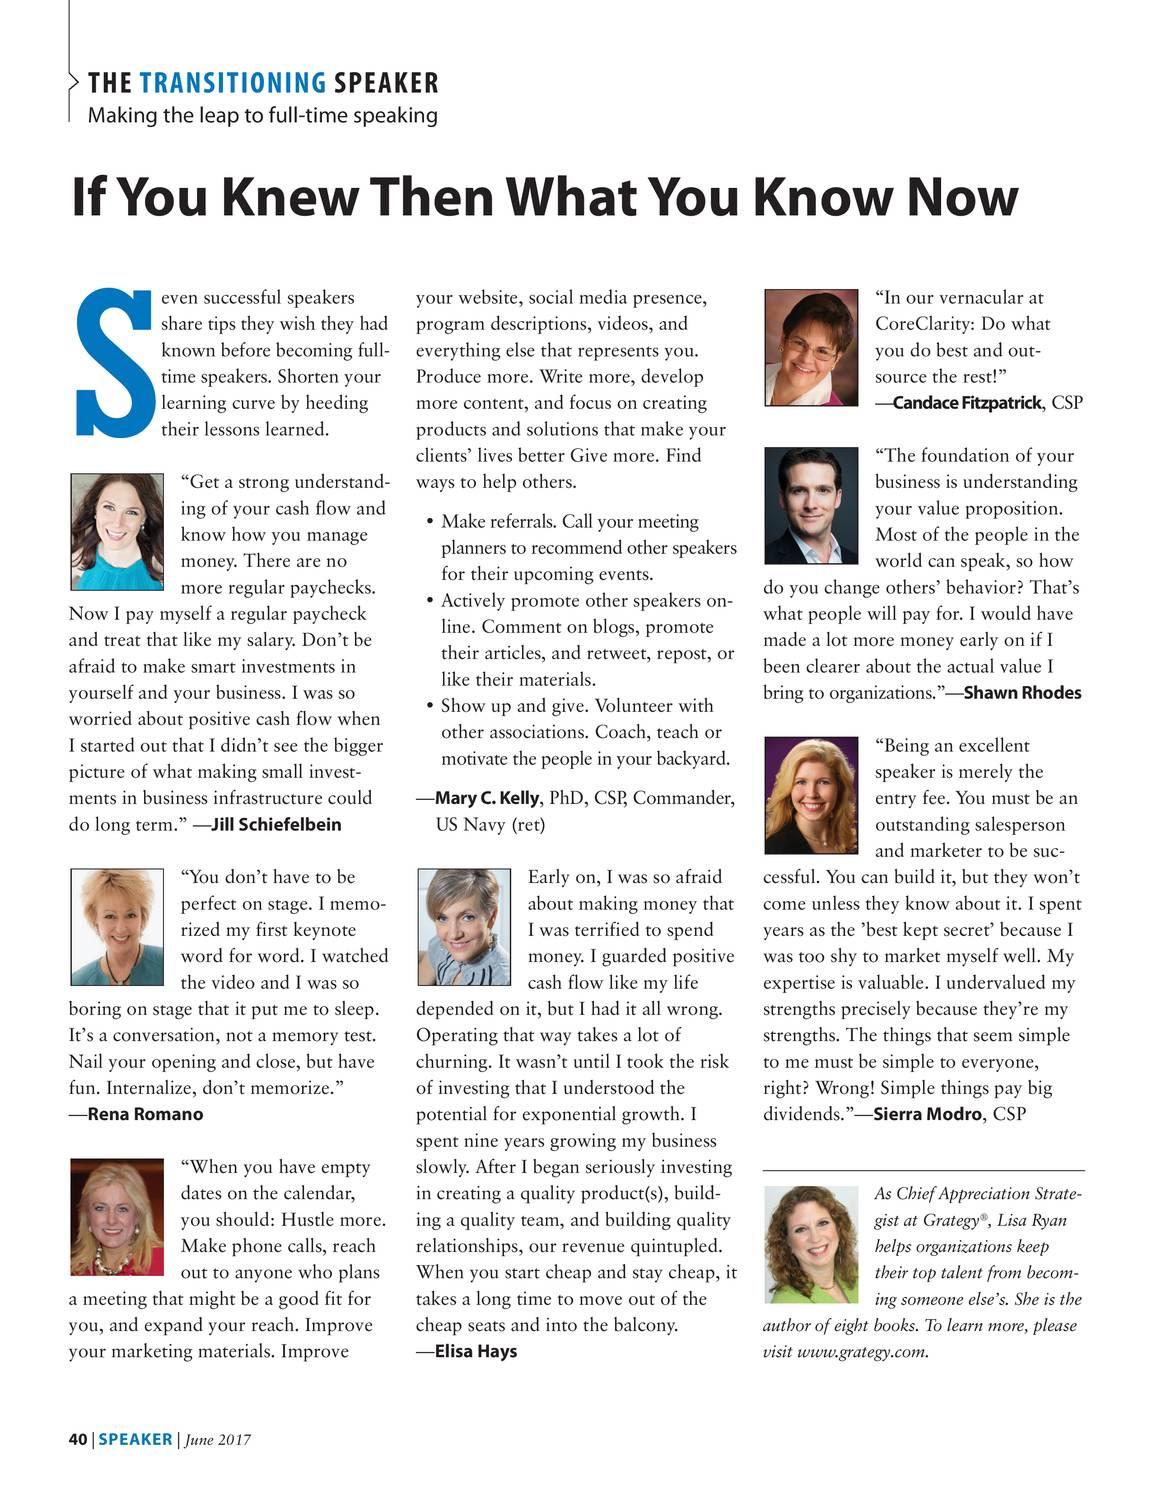 Speaker June 2017 Page 40